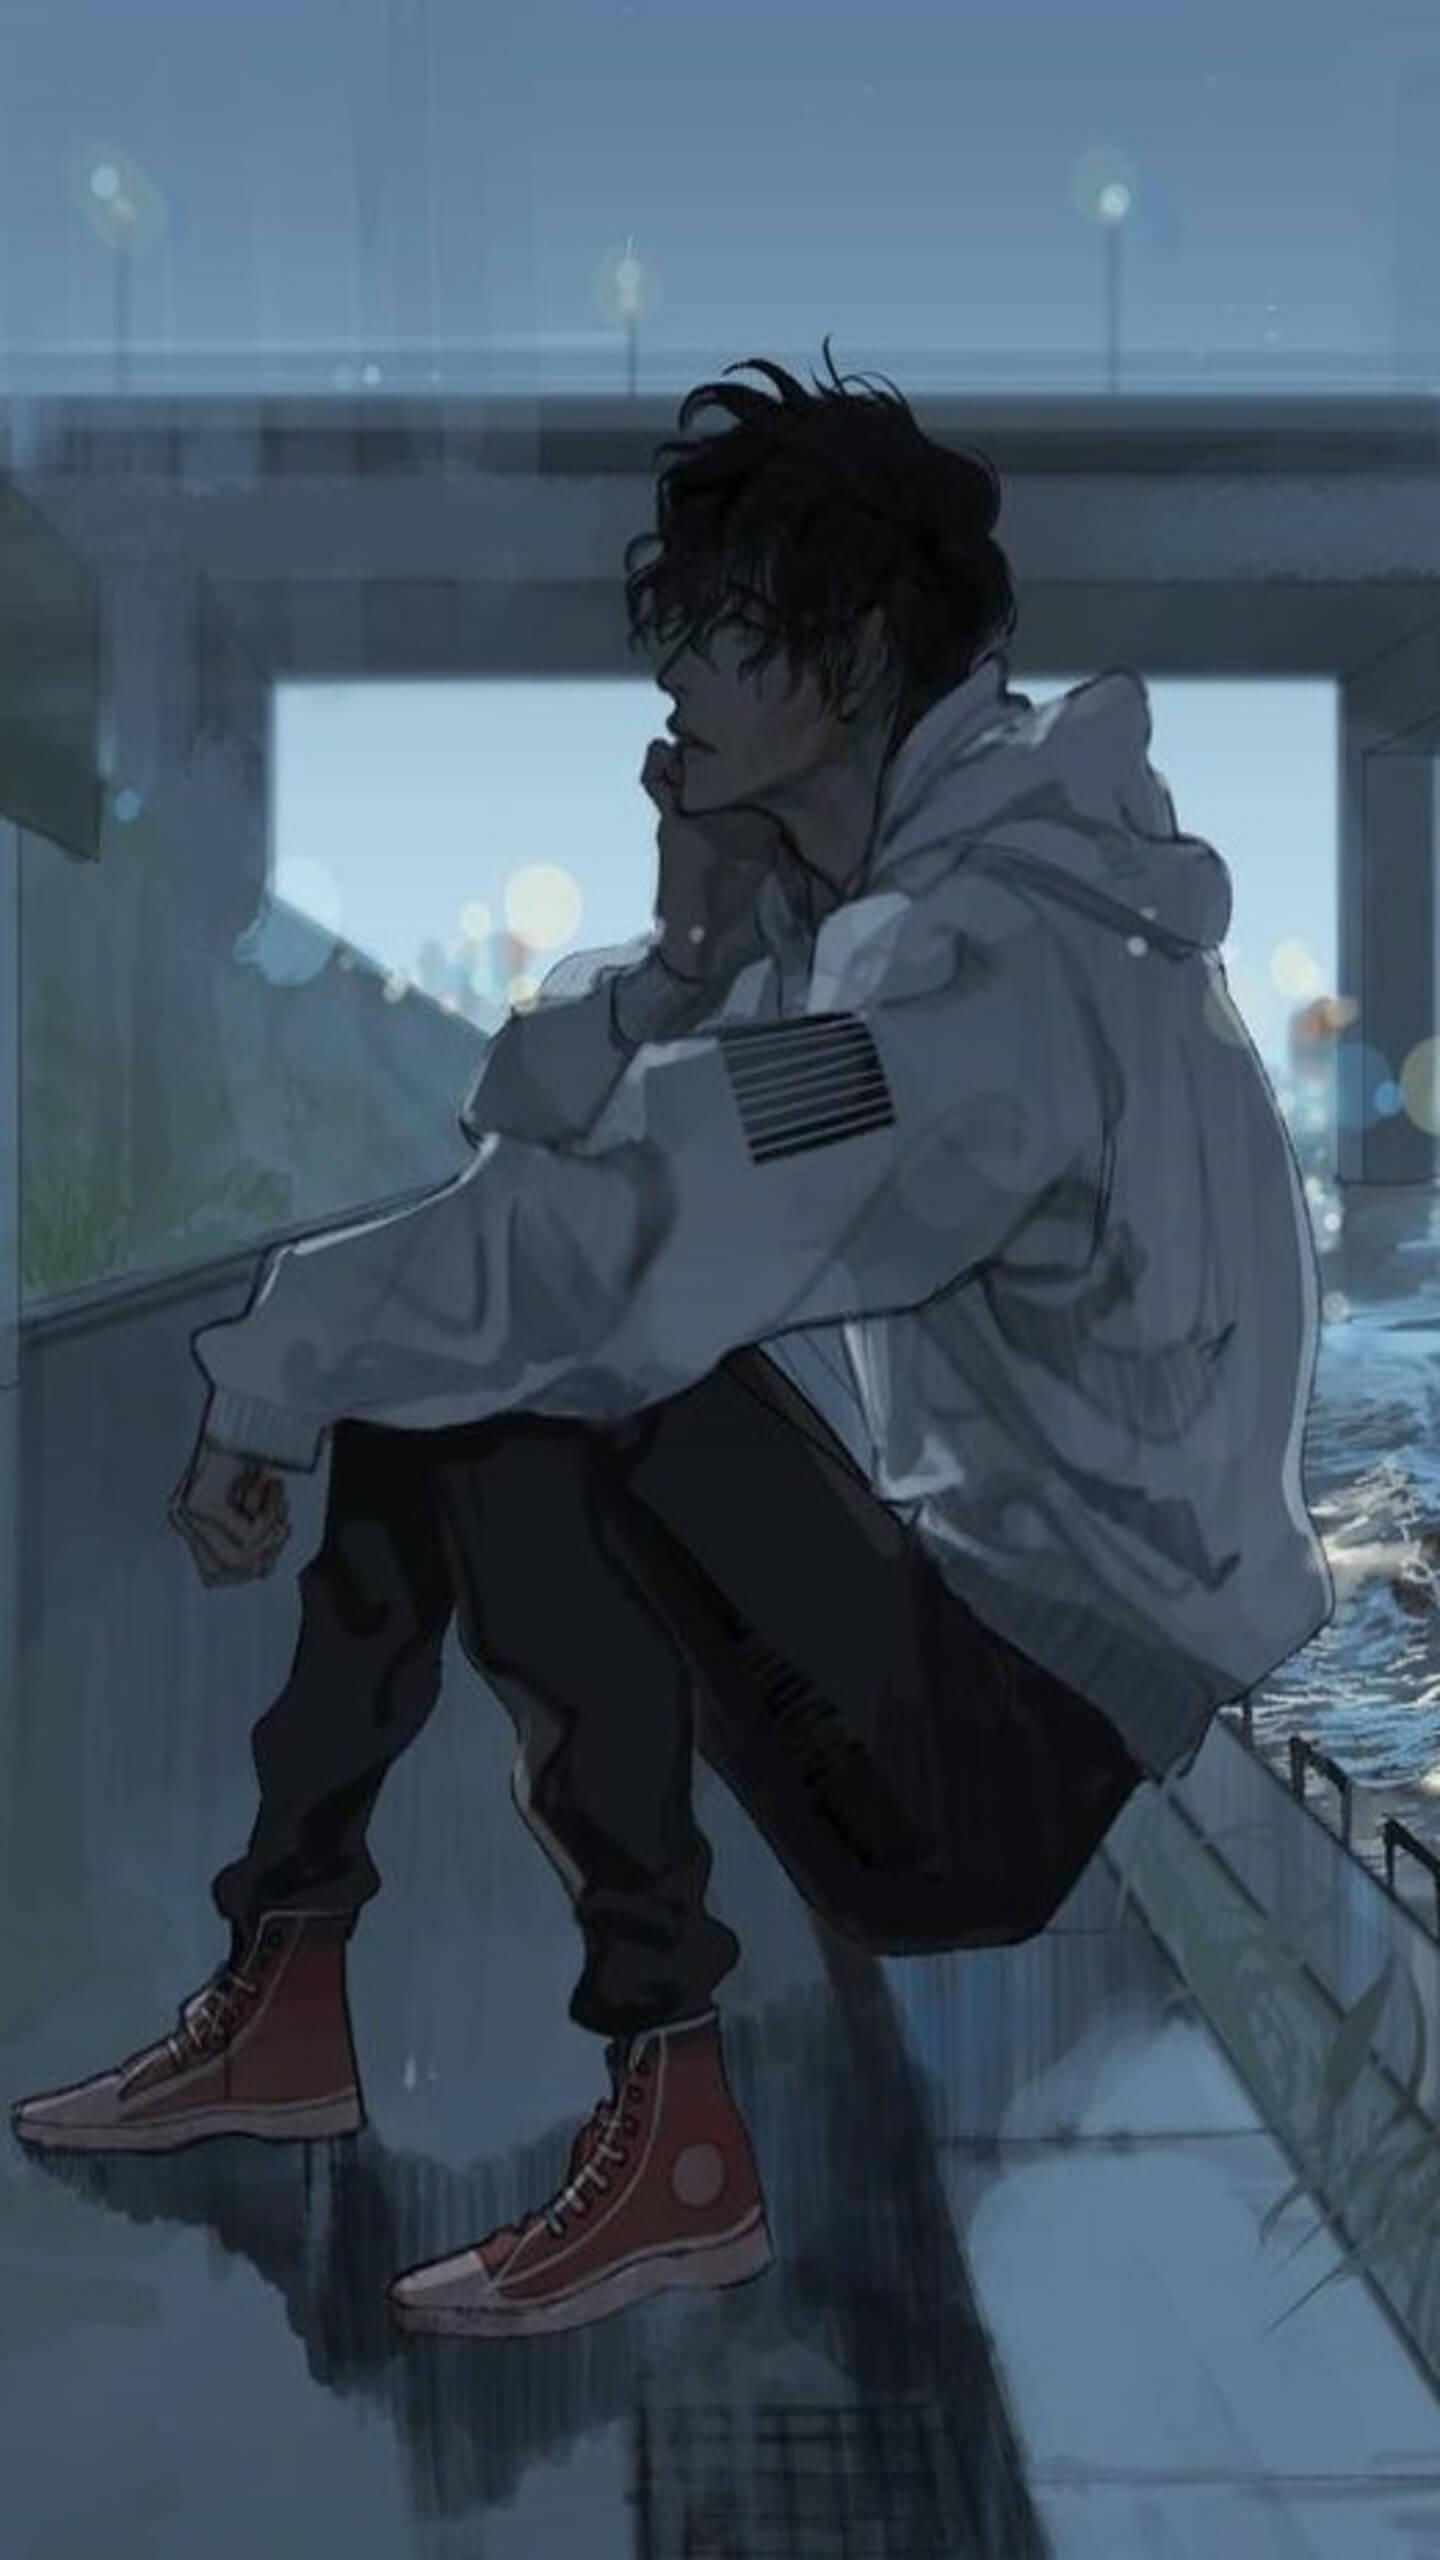 Depressed Anime Guy : depressed, anime, Depressed, Anime, Wallpaper